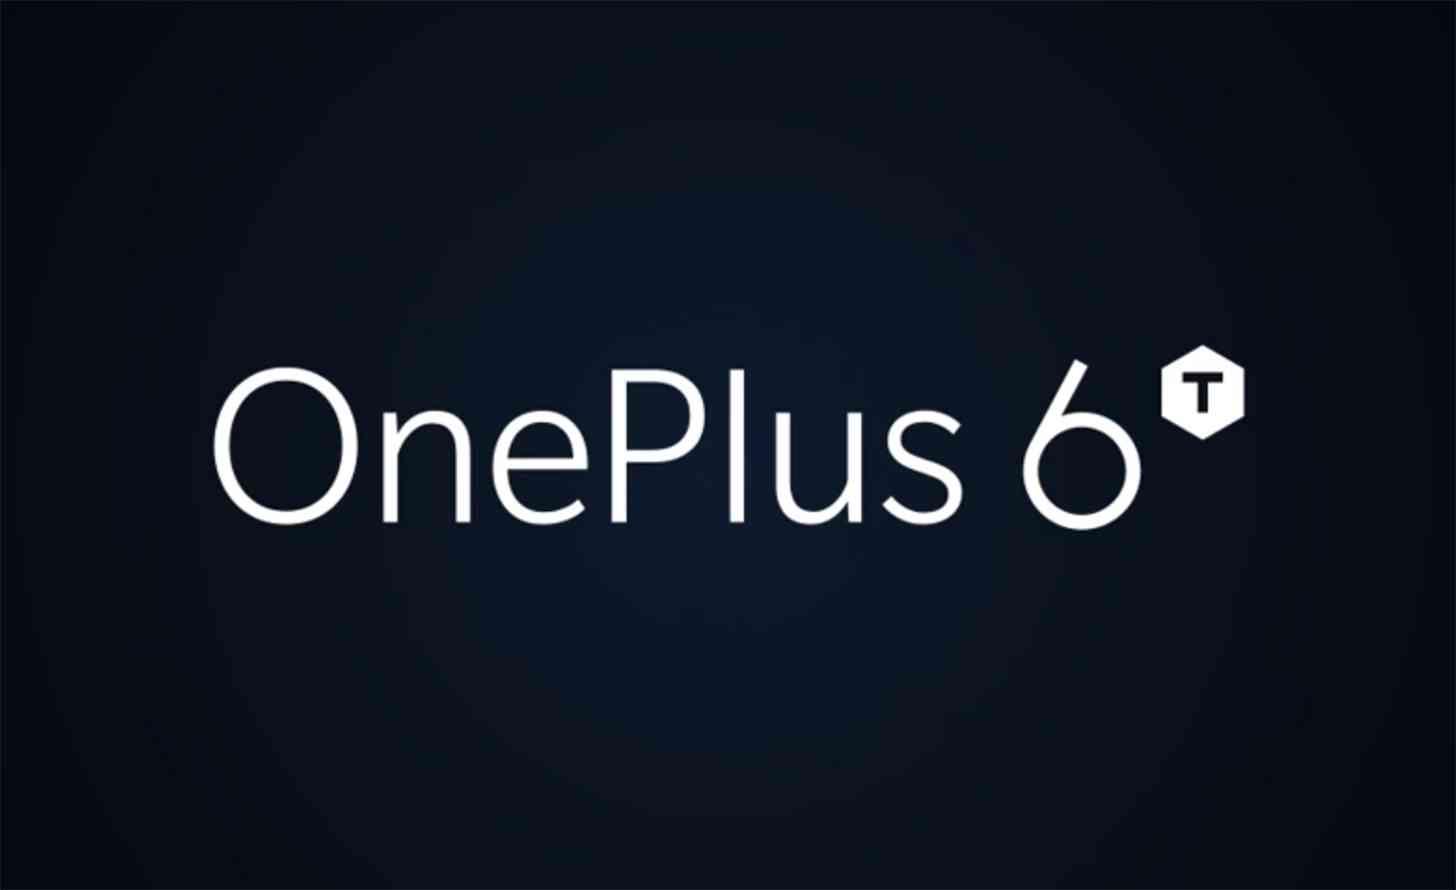 OnePlus 6T logo